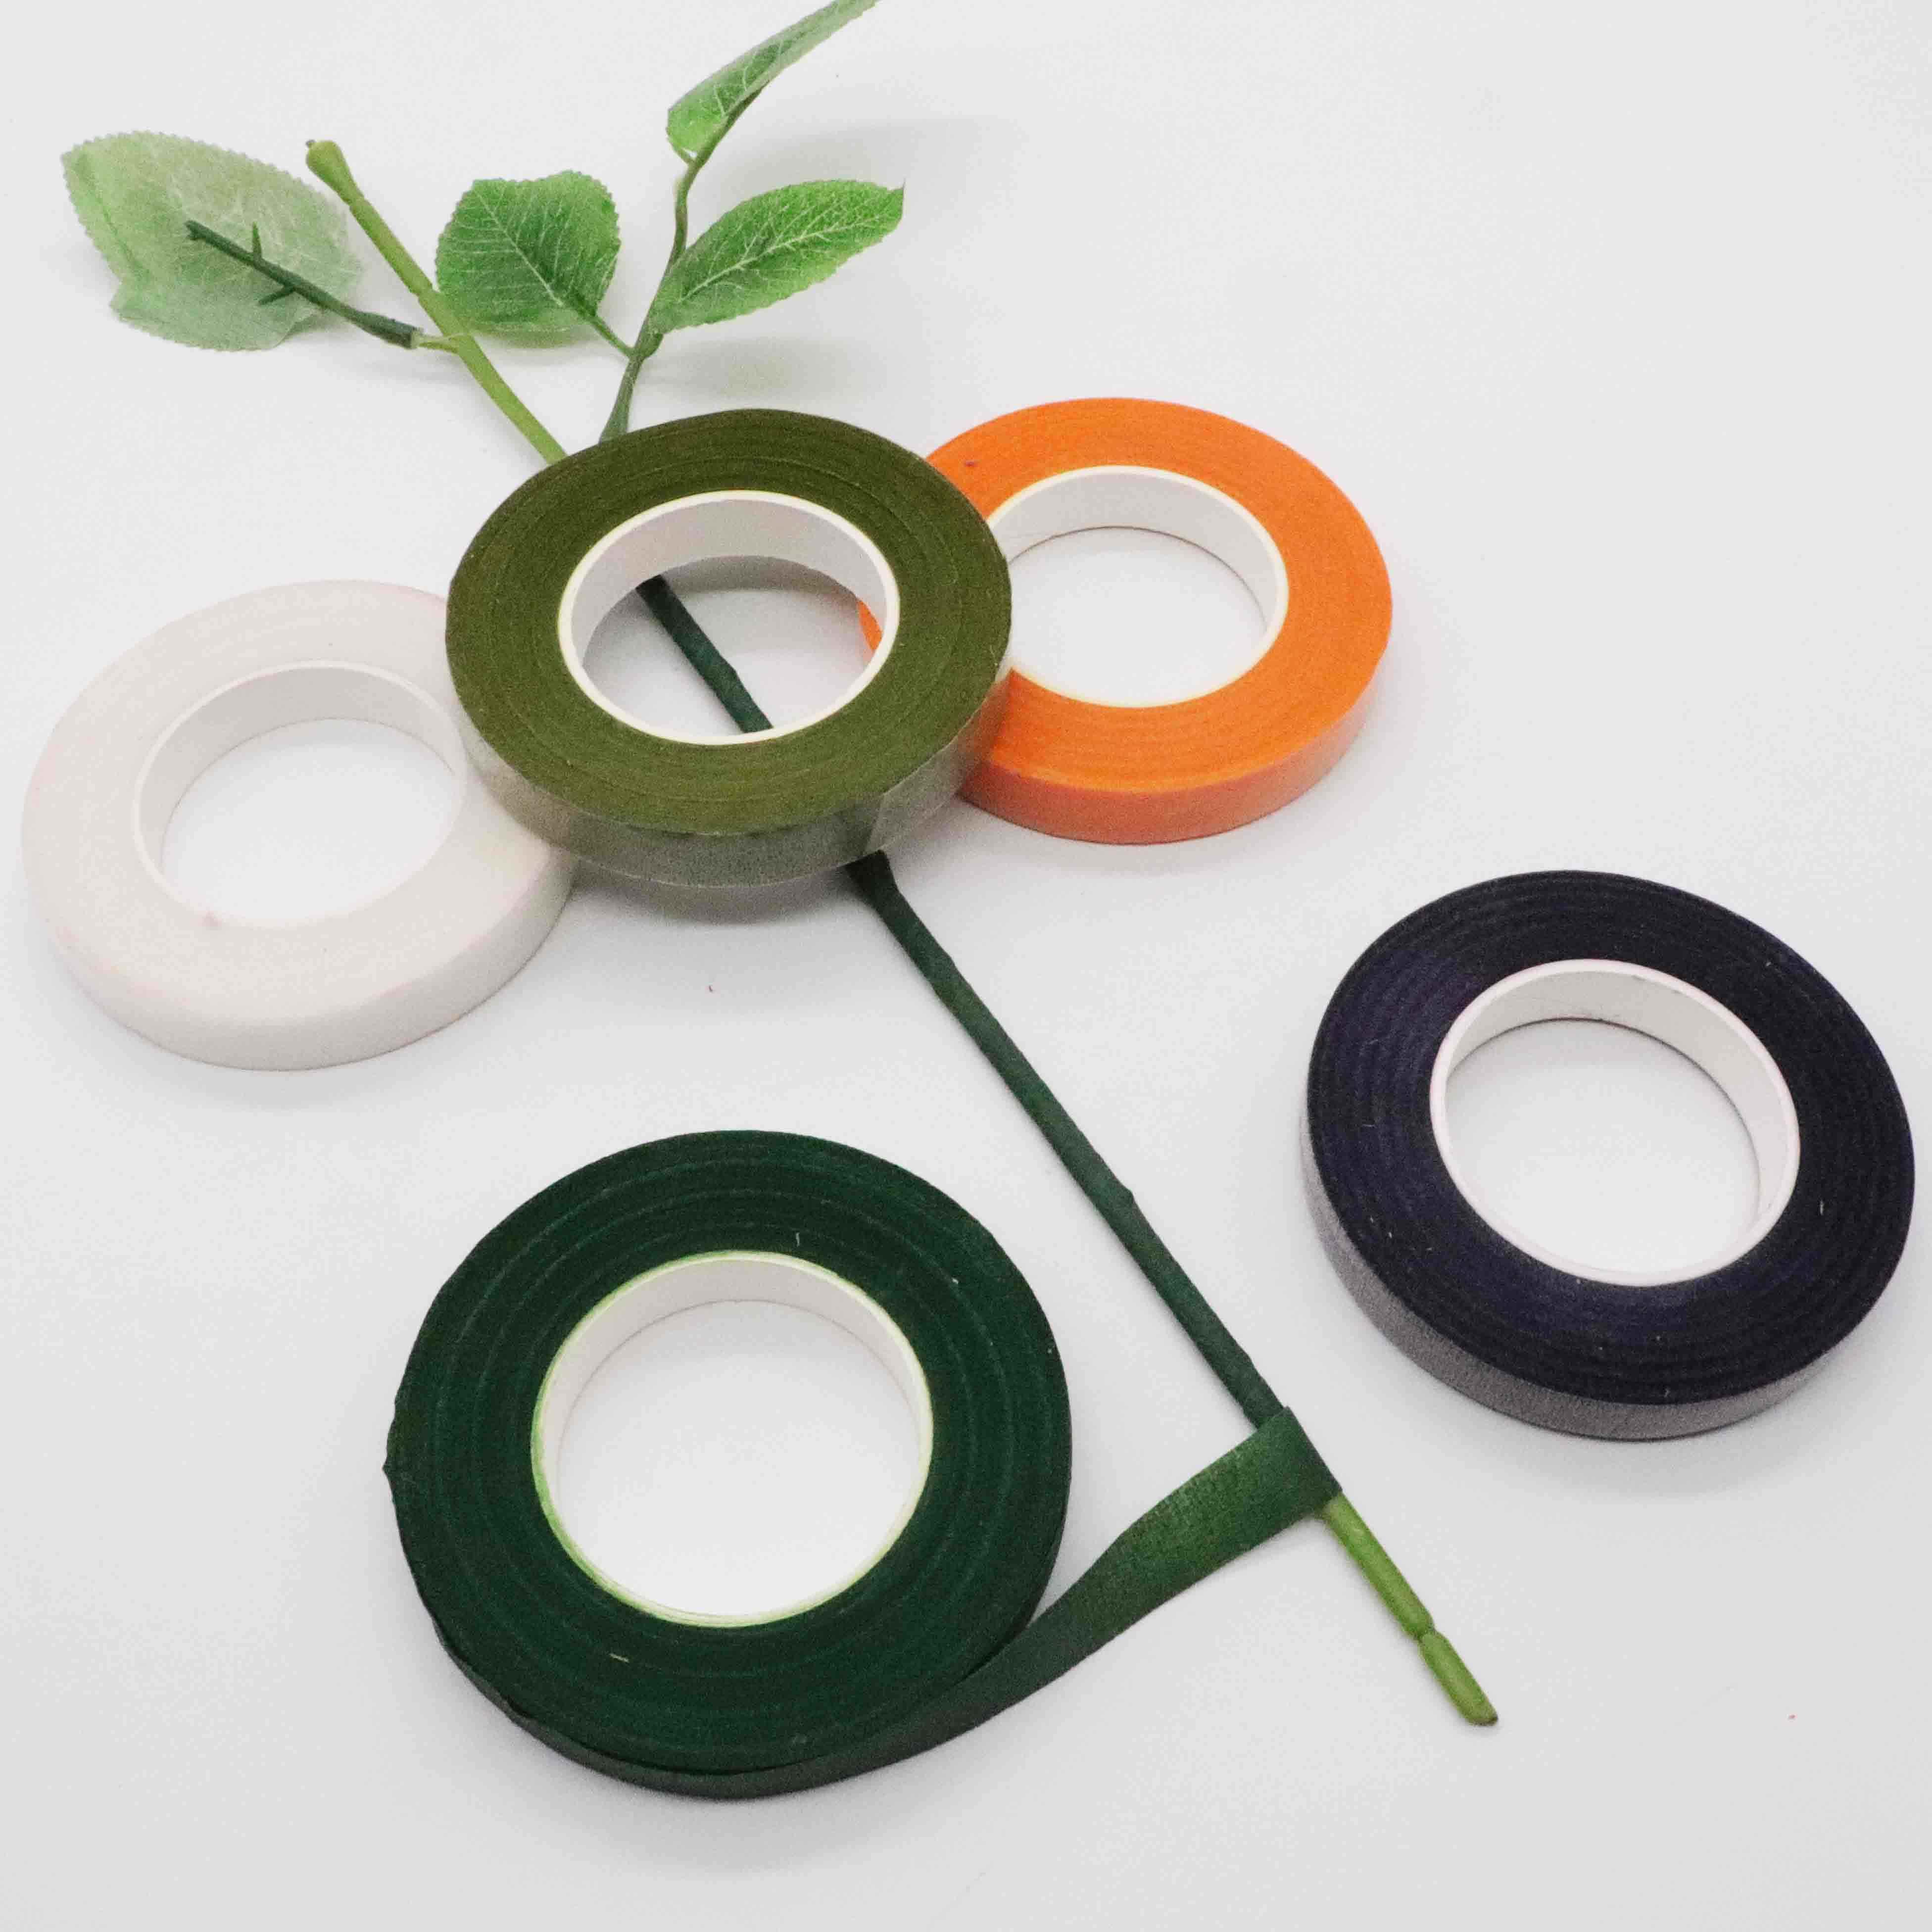 Bunga Hijau Tape 12 Mm X 45 M/Roll Pita Korsase Lubang Kancing Buatan Bunga Benang Sari Bungkus Bunga Hijau Tape elastis Tape